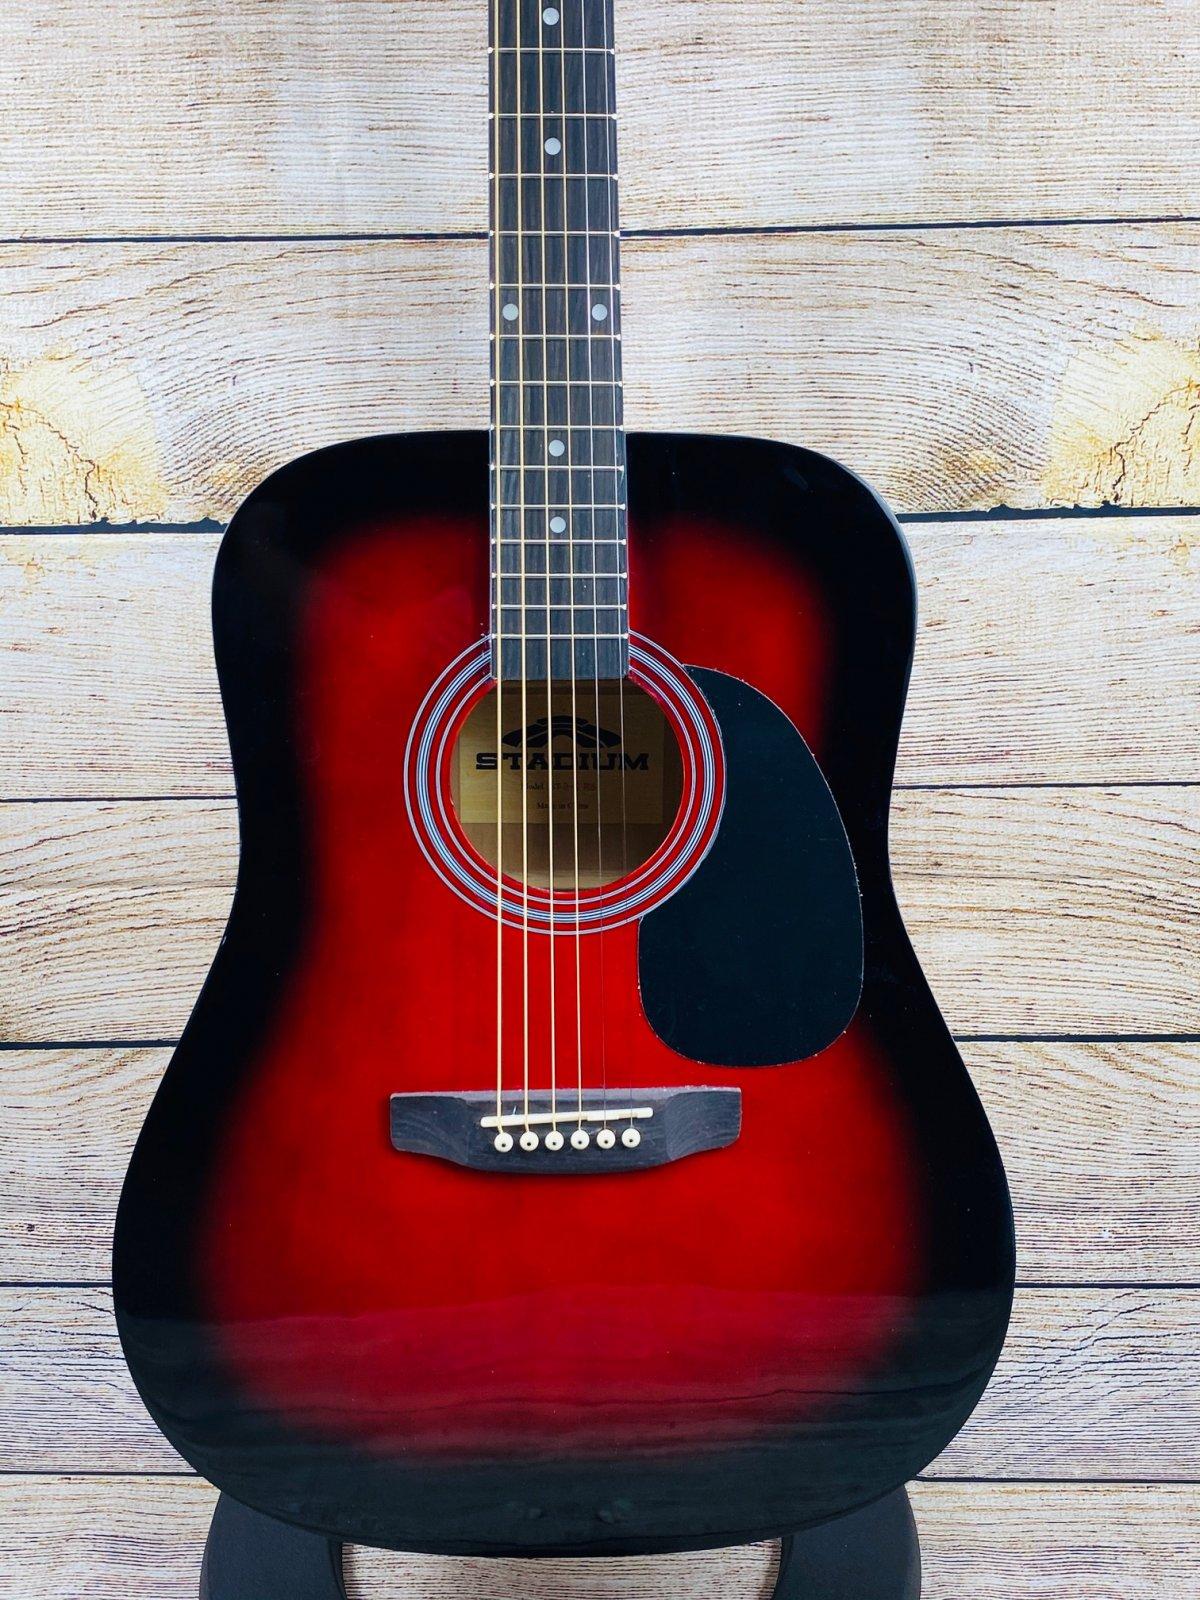 Stadium D-42 Steel string Acoustic Guitar, Red